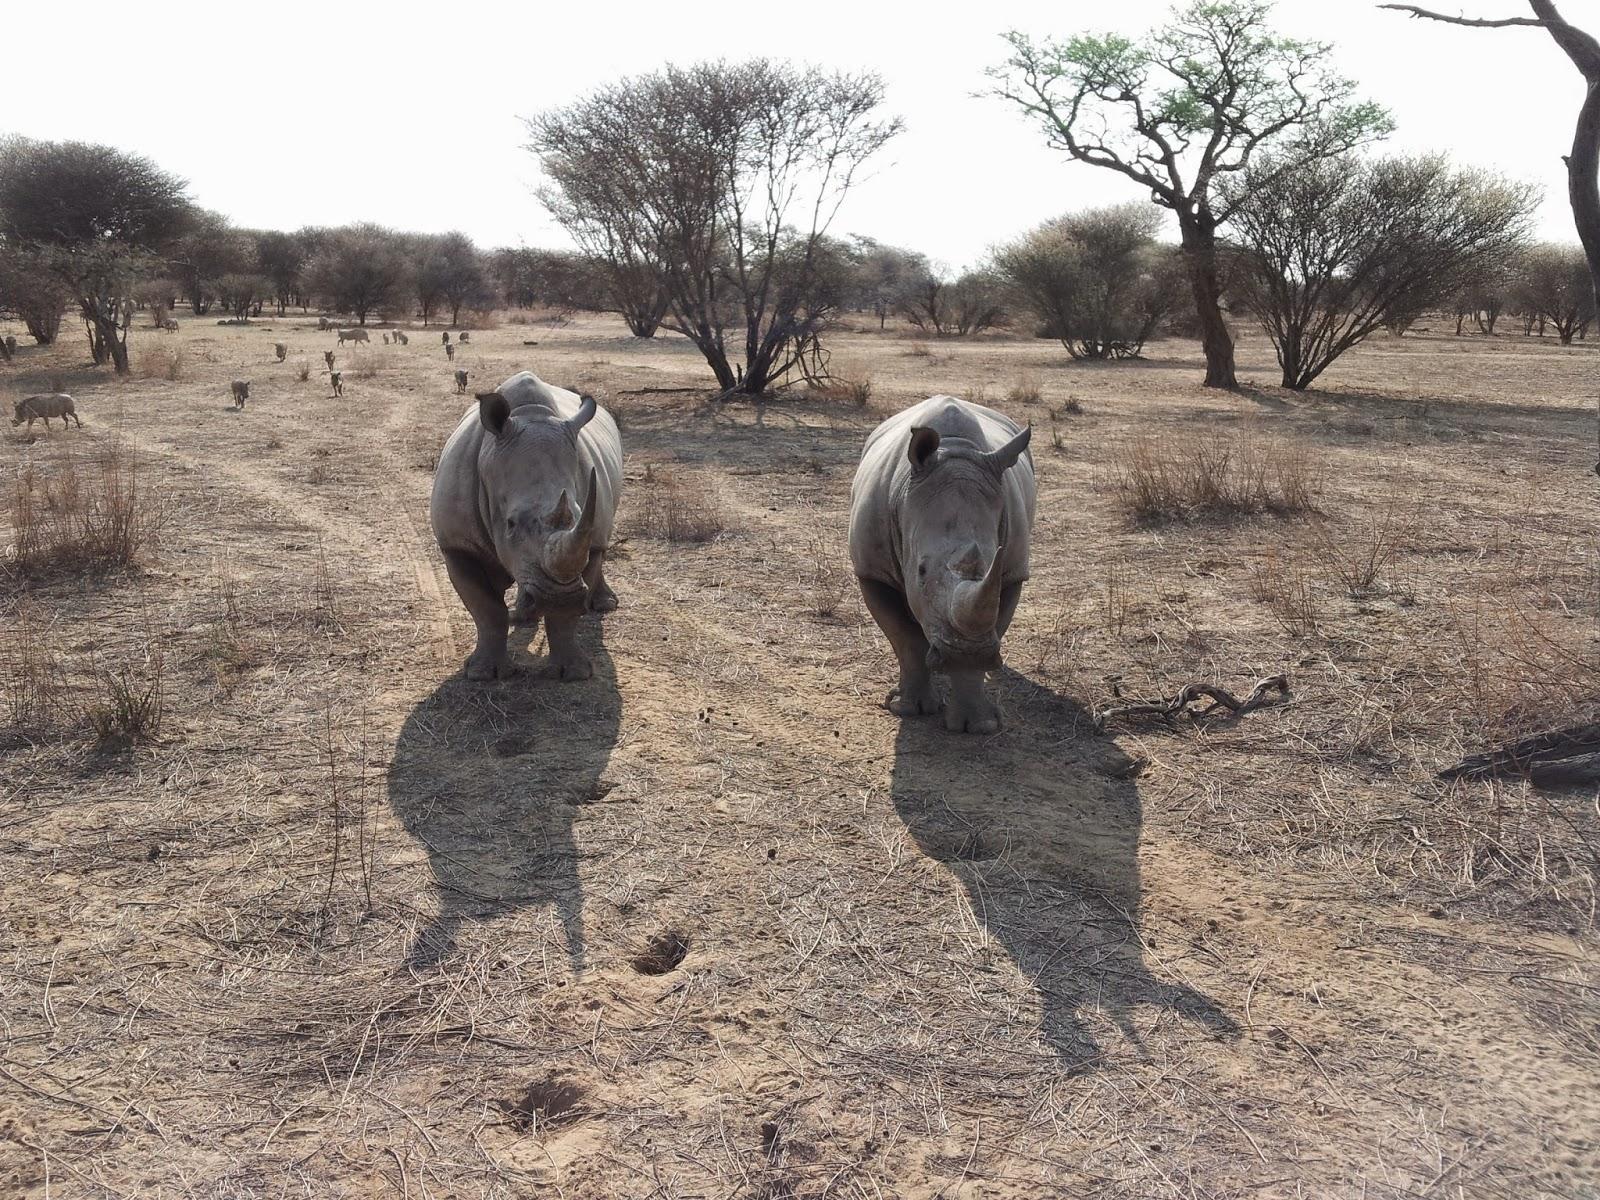 Namibian rhinos - www.namibweb.com